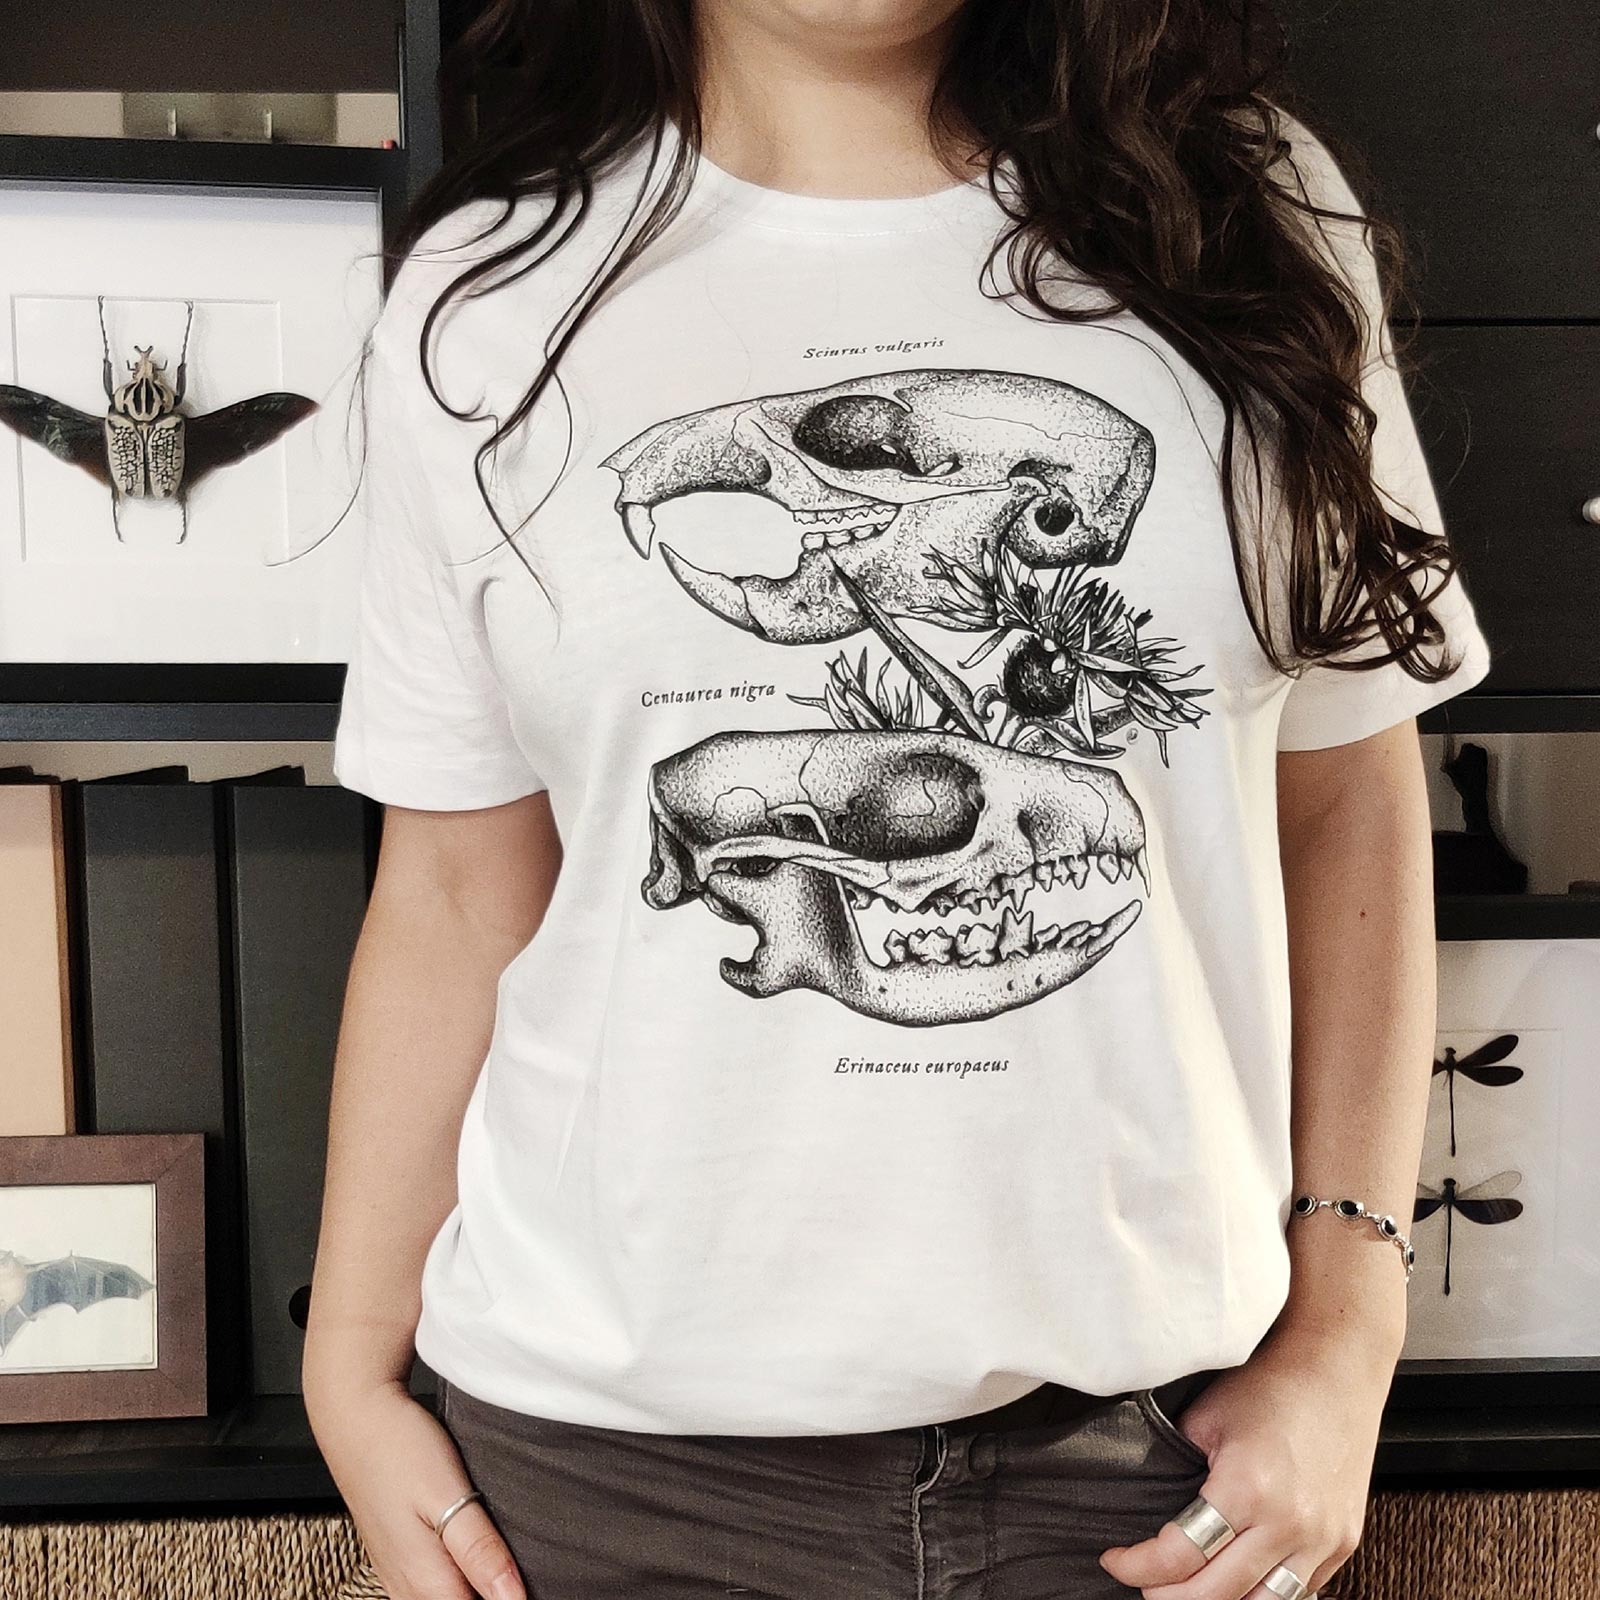 Craneos_ardilla_erizo_isaloureiro_camiseta